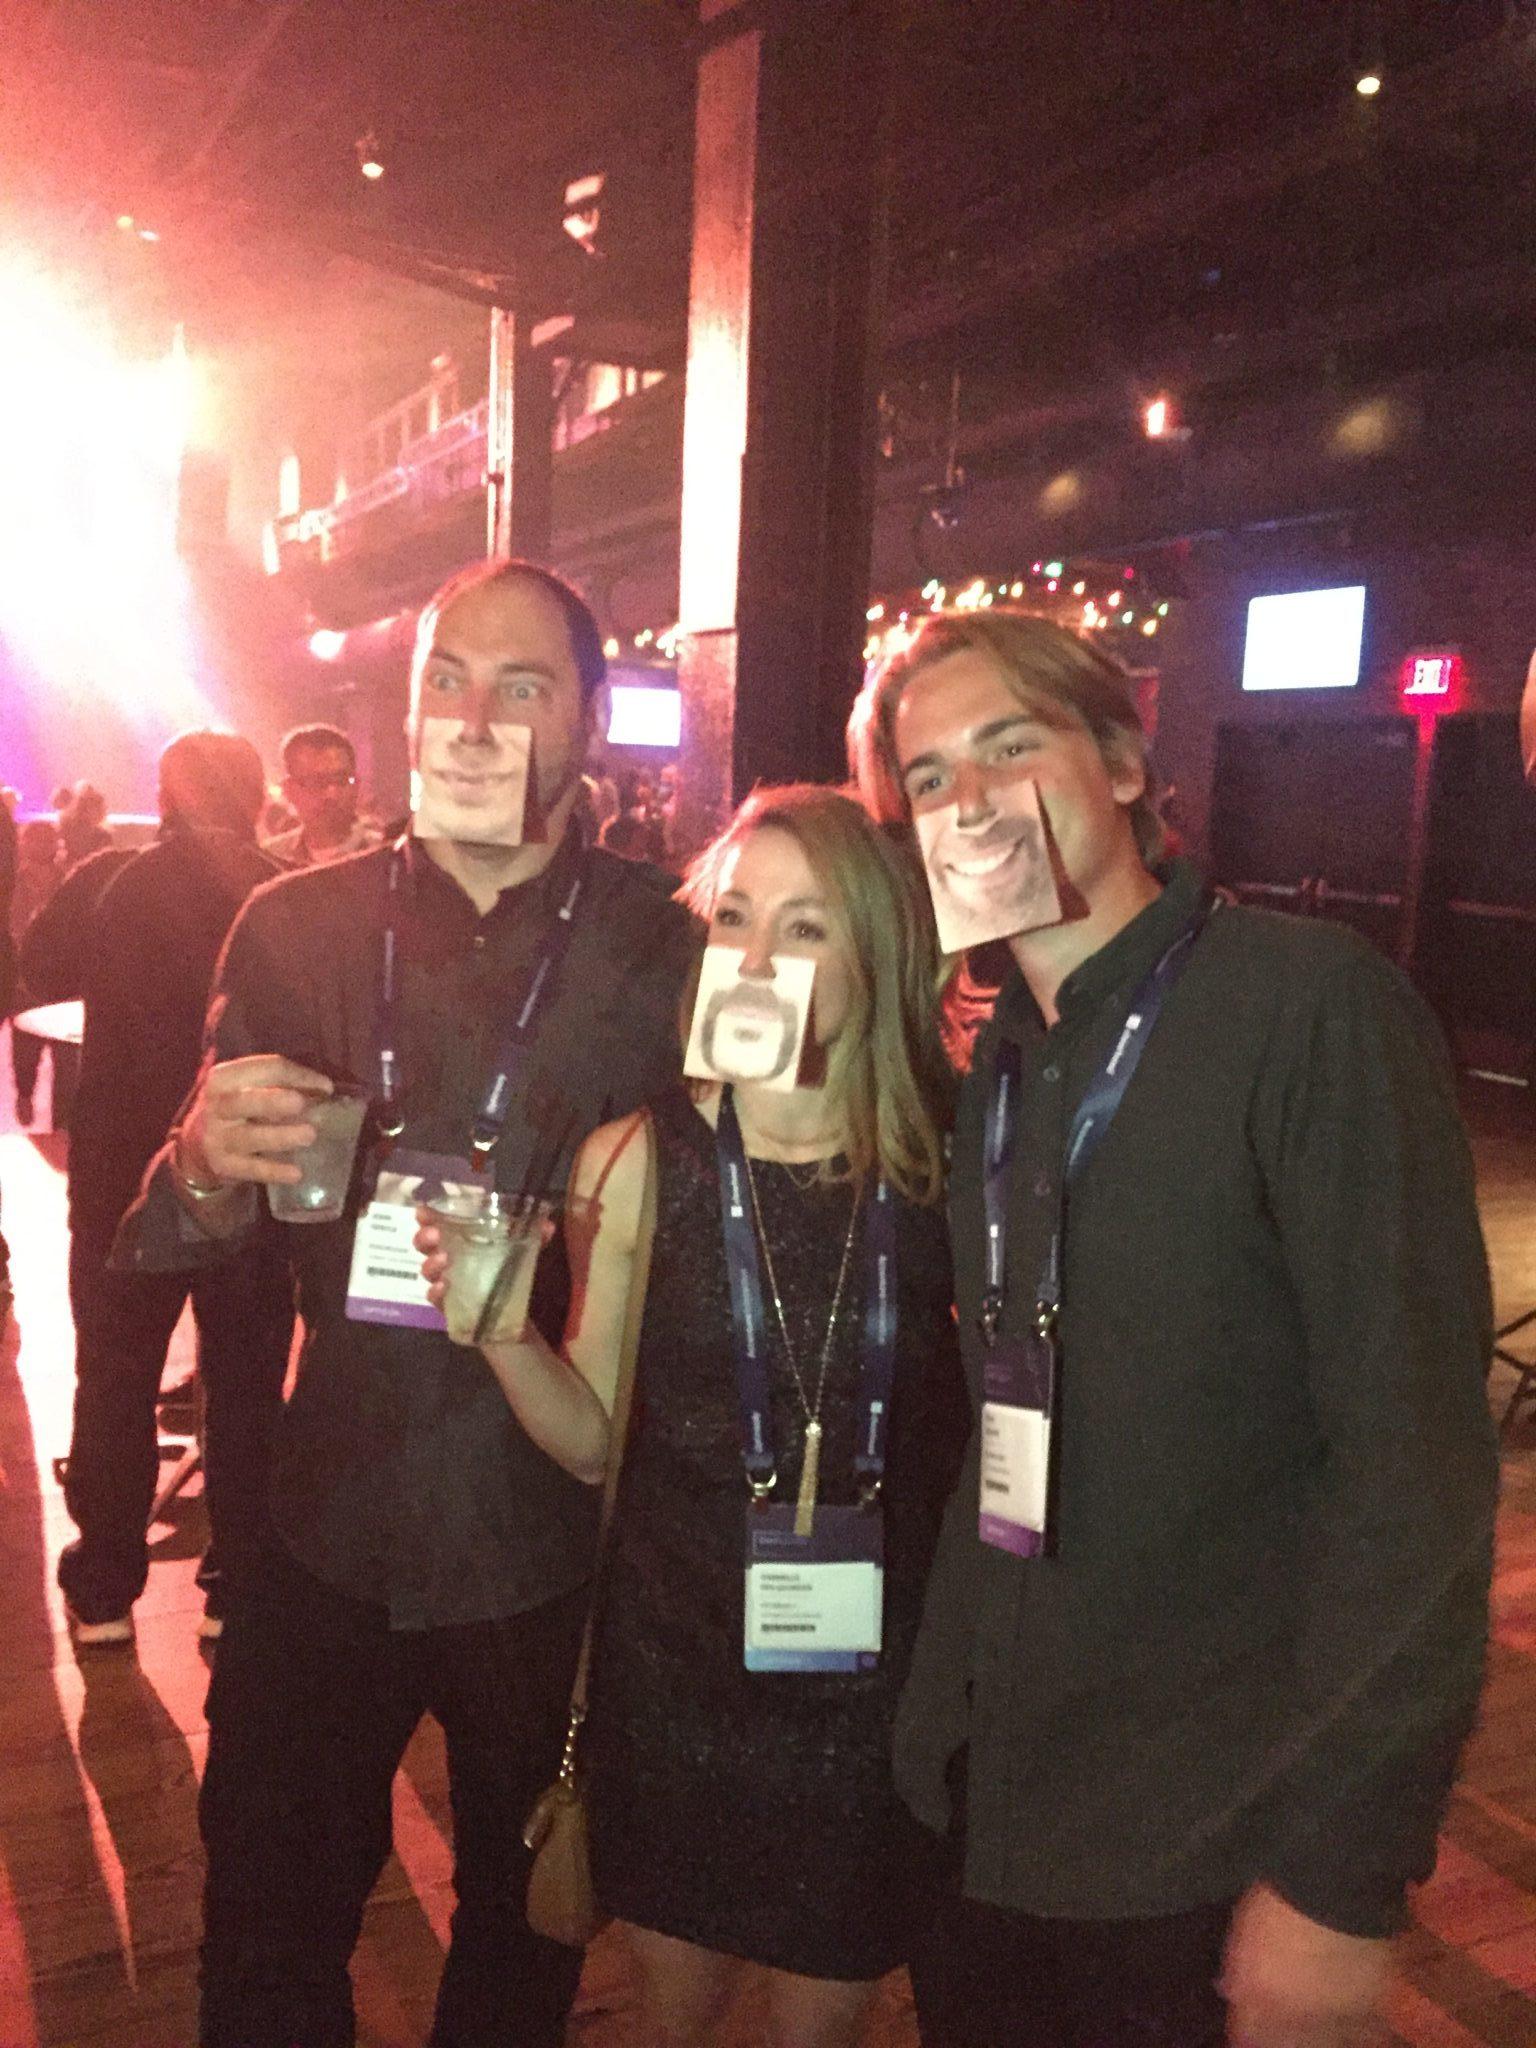 Opticon 2017 - Three people wearing face coasters